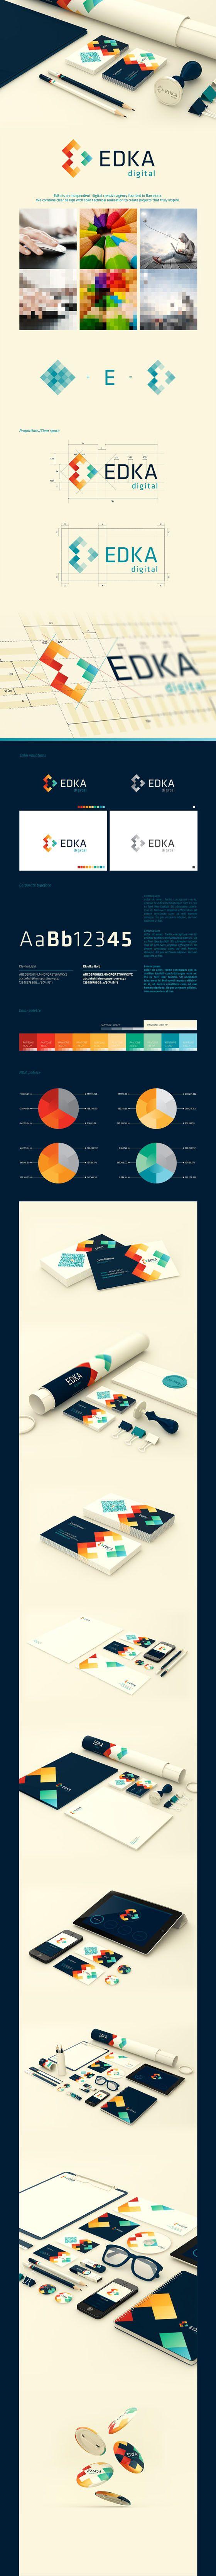 Visual Identity and Branding Series  Edka Digital